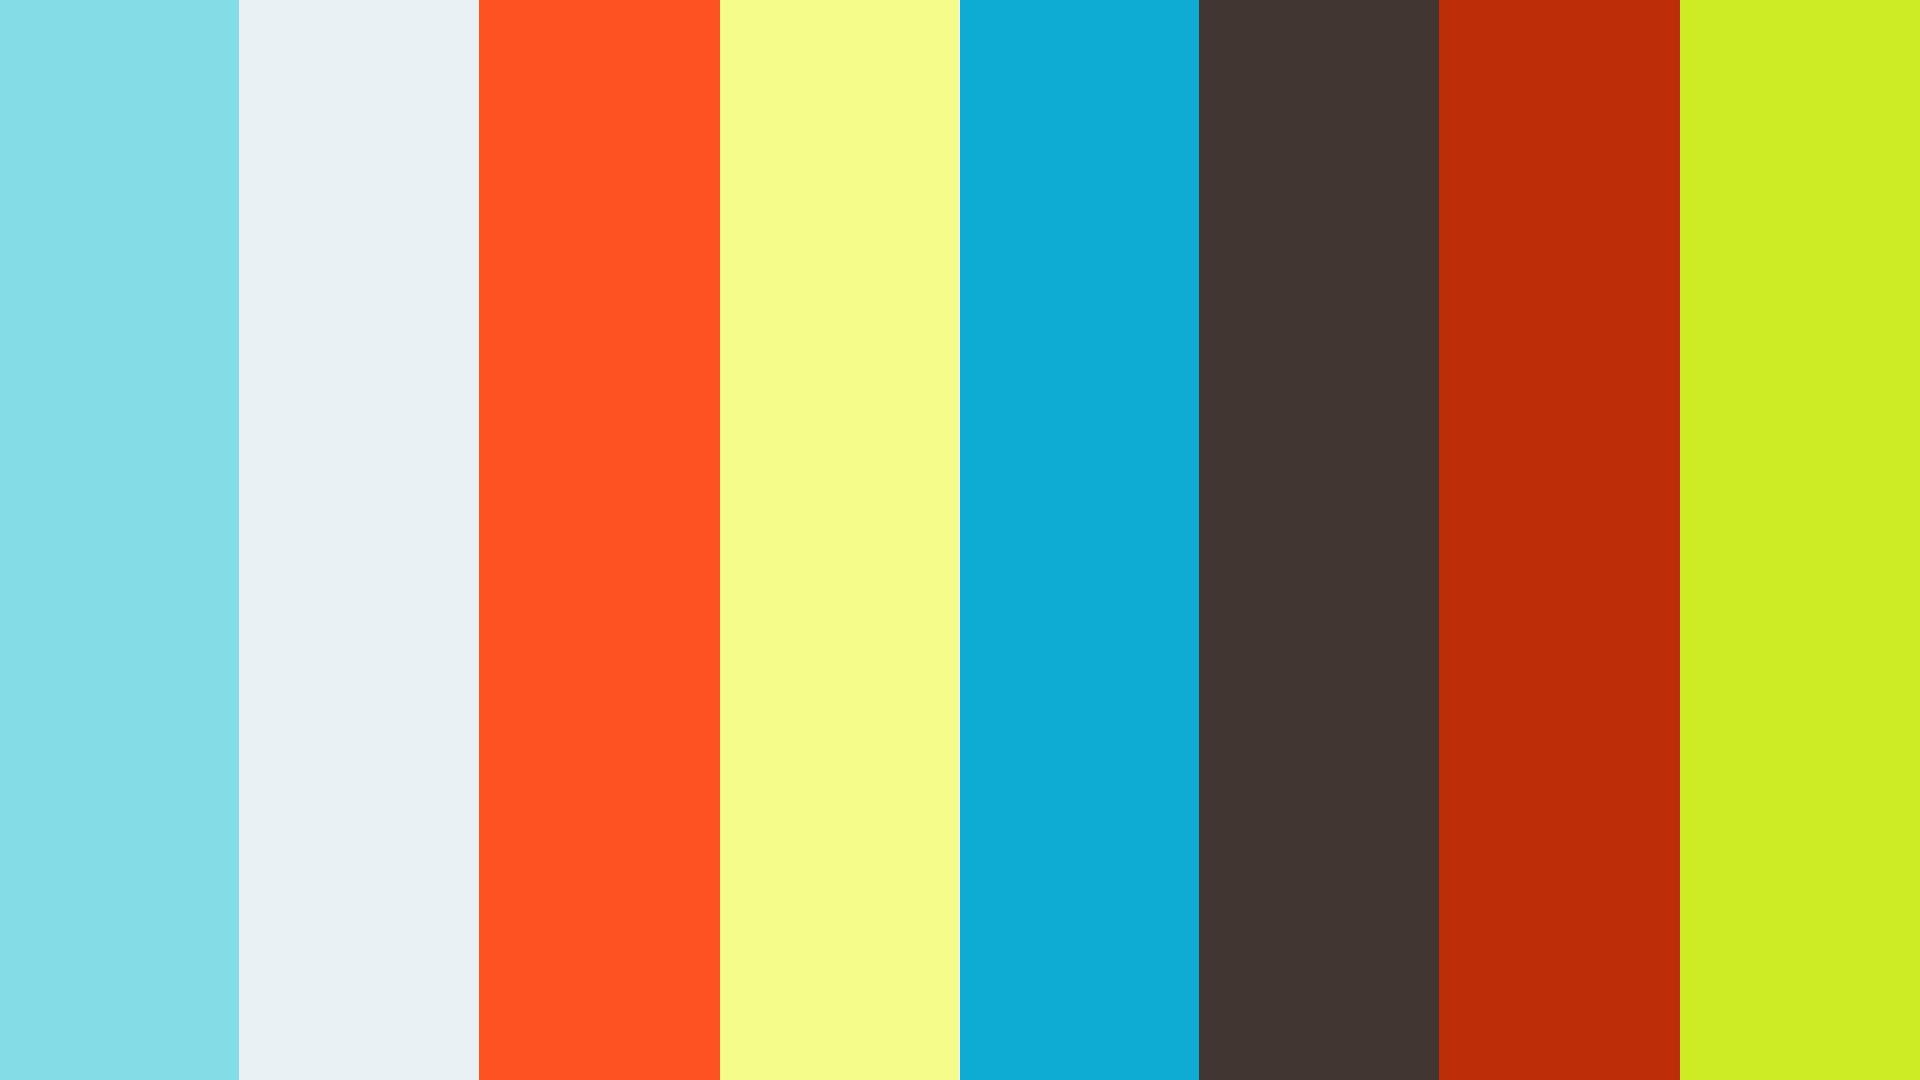 203° Anniversario d' Indipendenza dell' Ecuador - Isola del Cinema -Roma